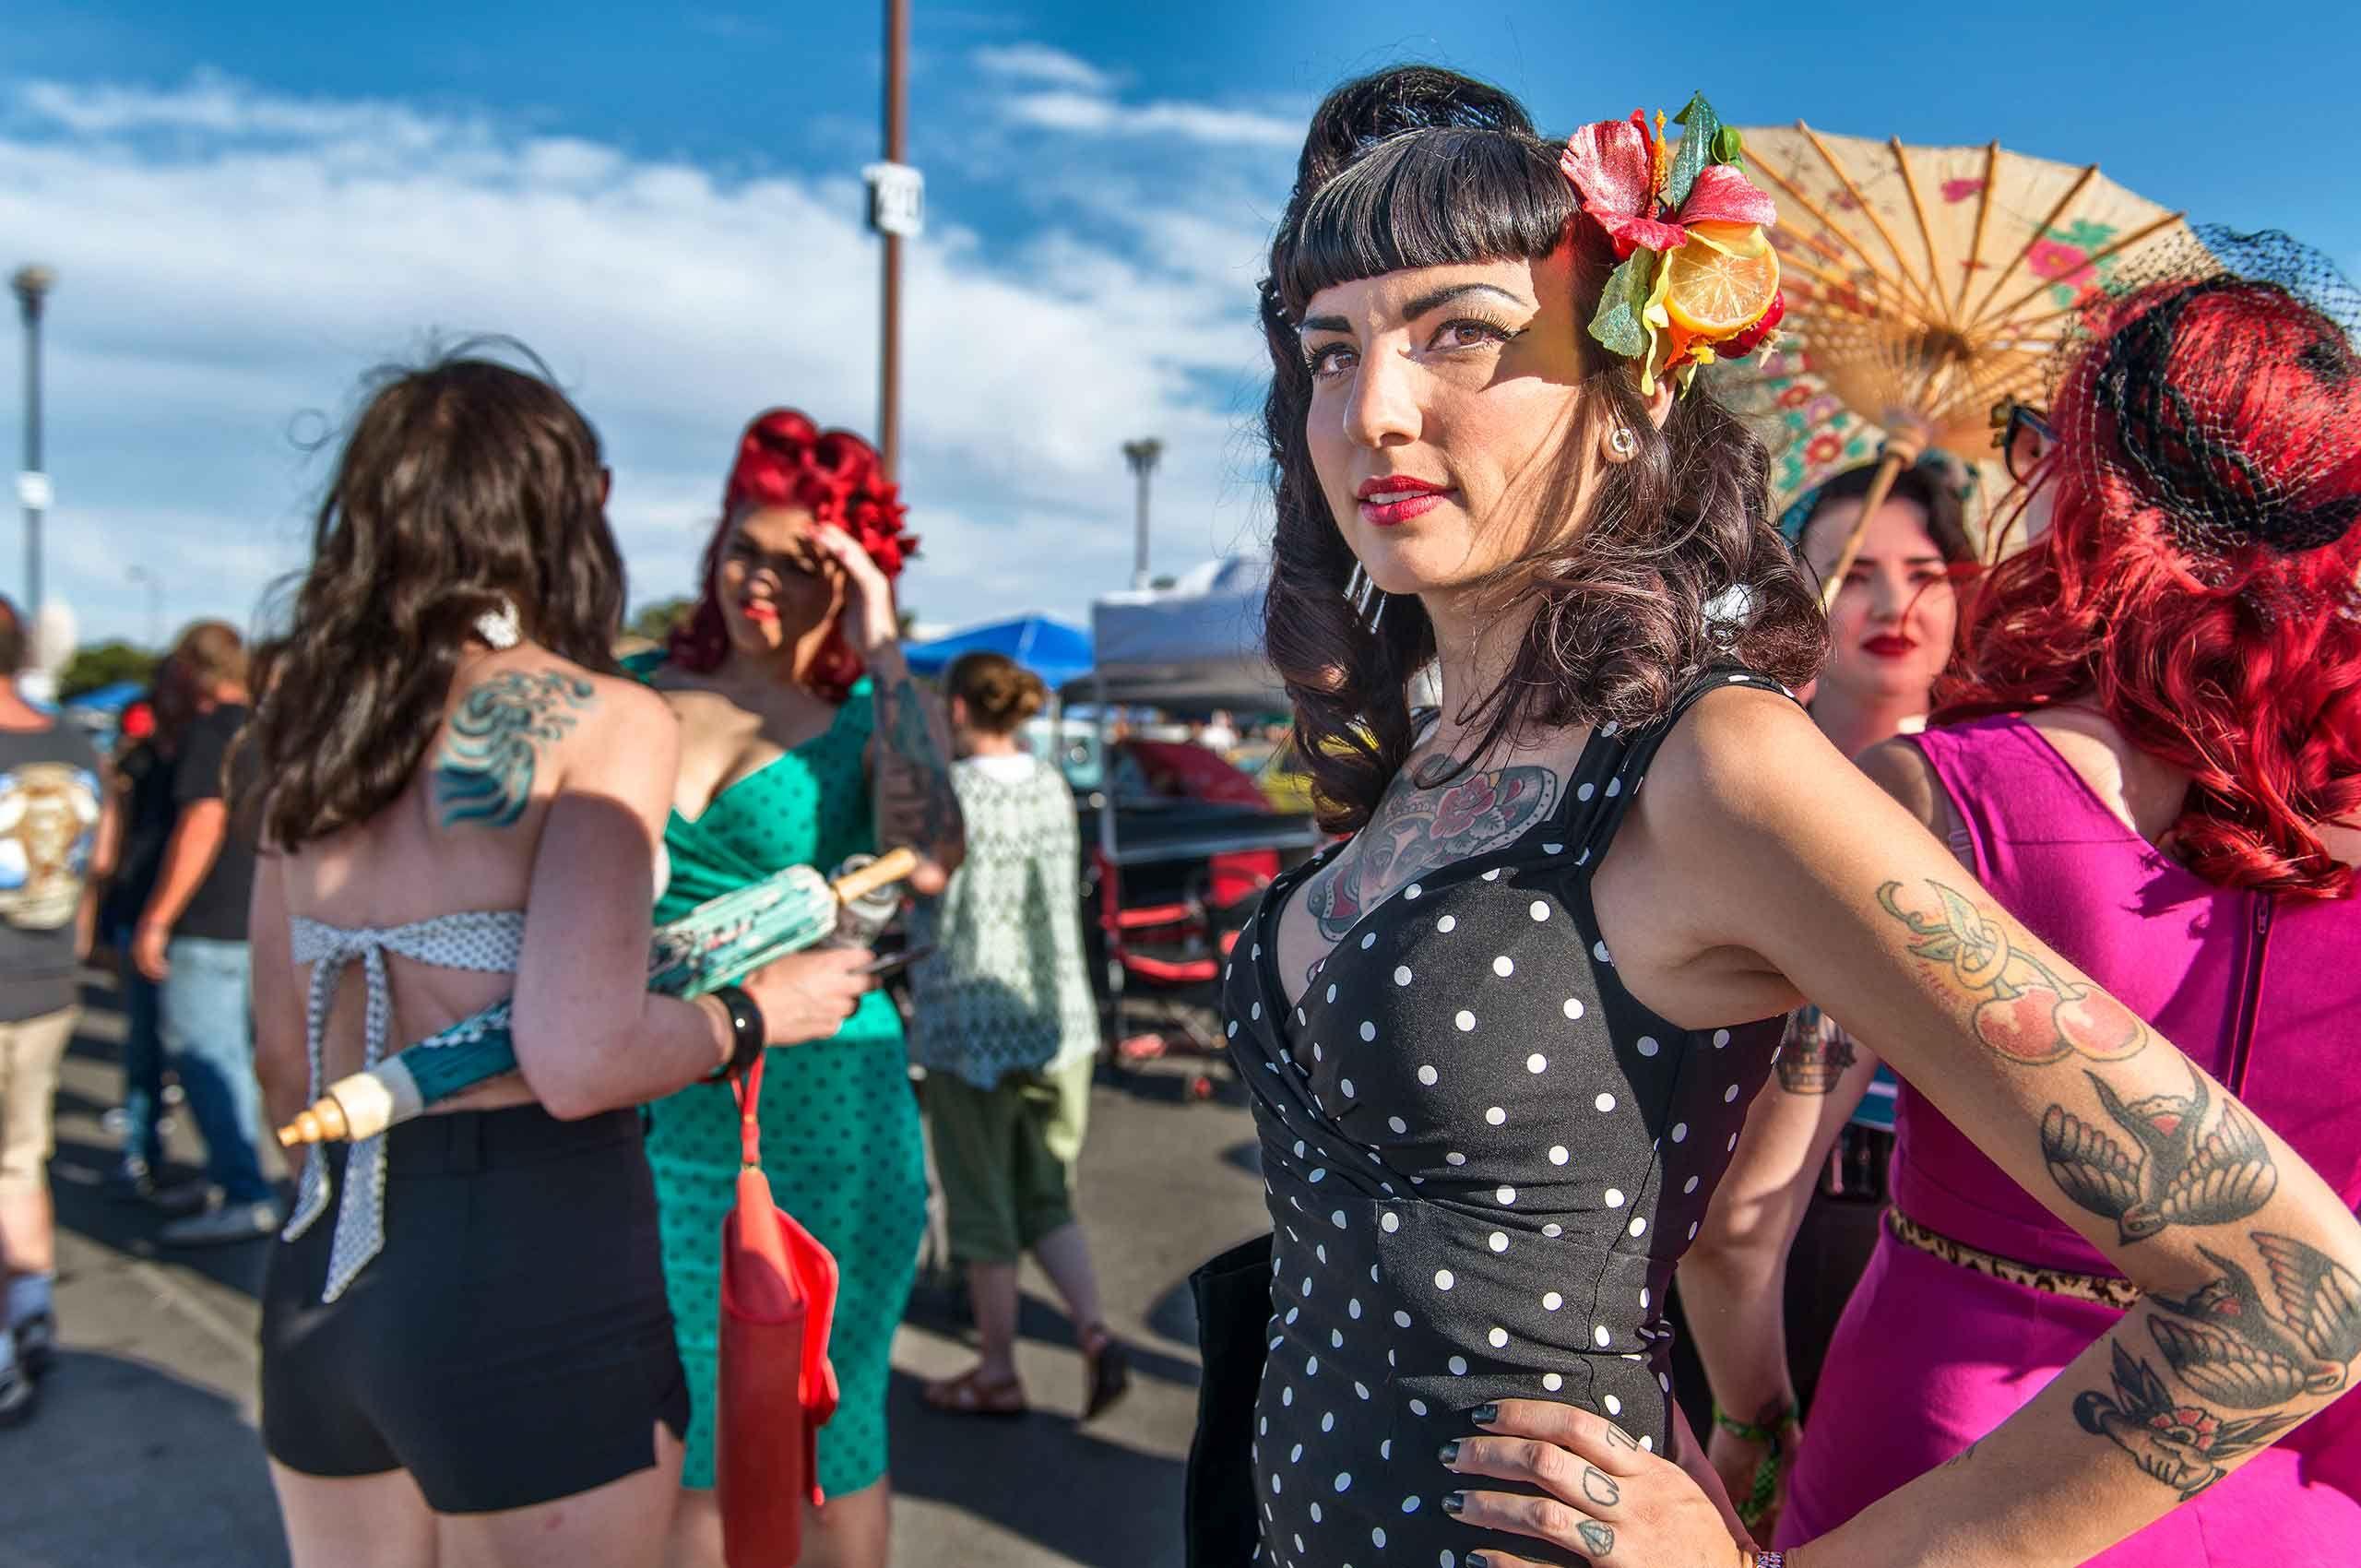 femalegathering-vivalasvegas-rockabillyweekend-lasvegas-by-henrikolundphotography.jpg